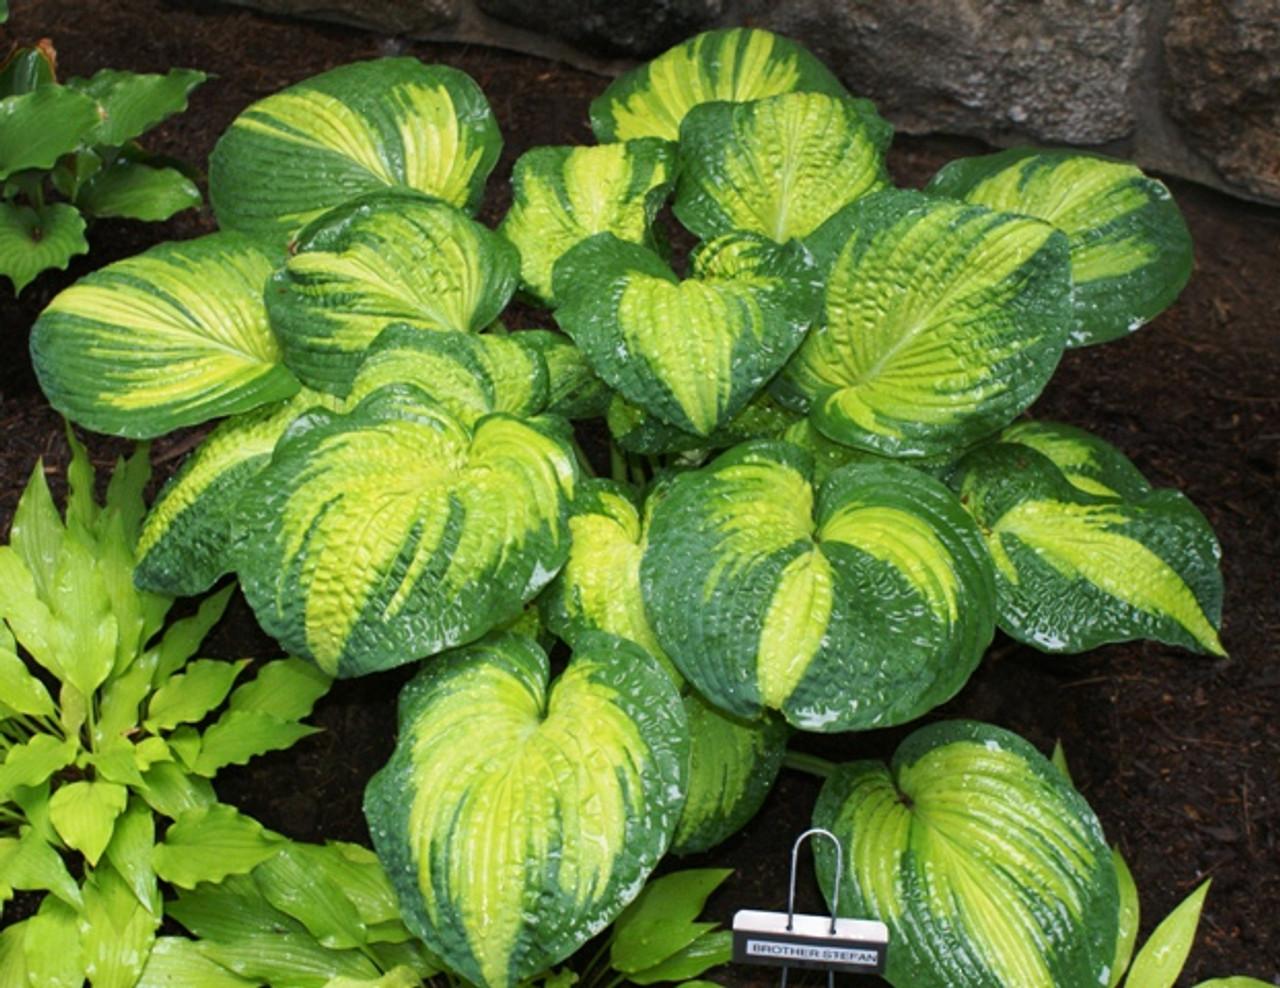 Brother Stefan Hosta Shade Perennial Slug Resistant Hosta Plant